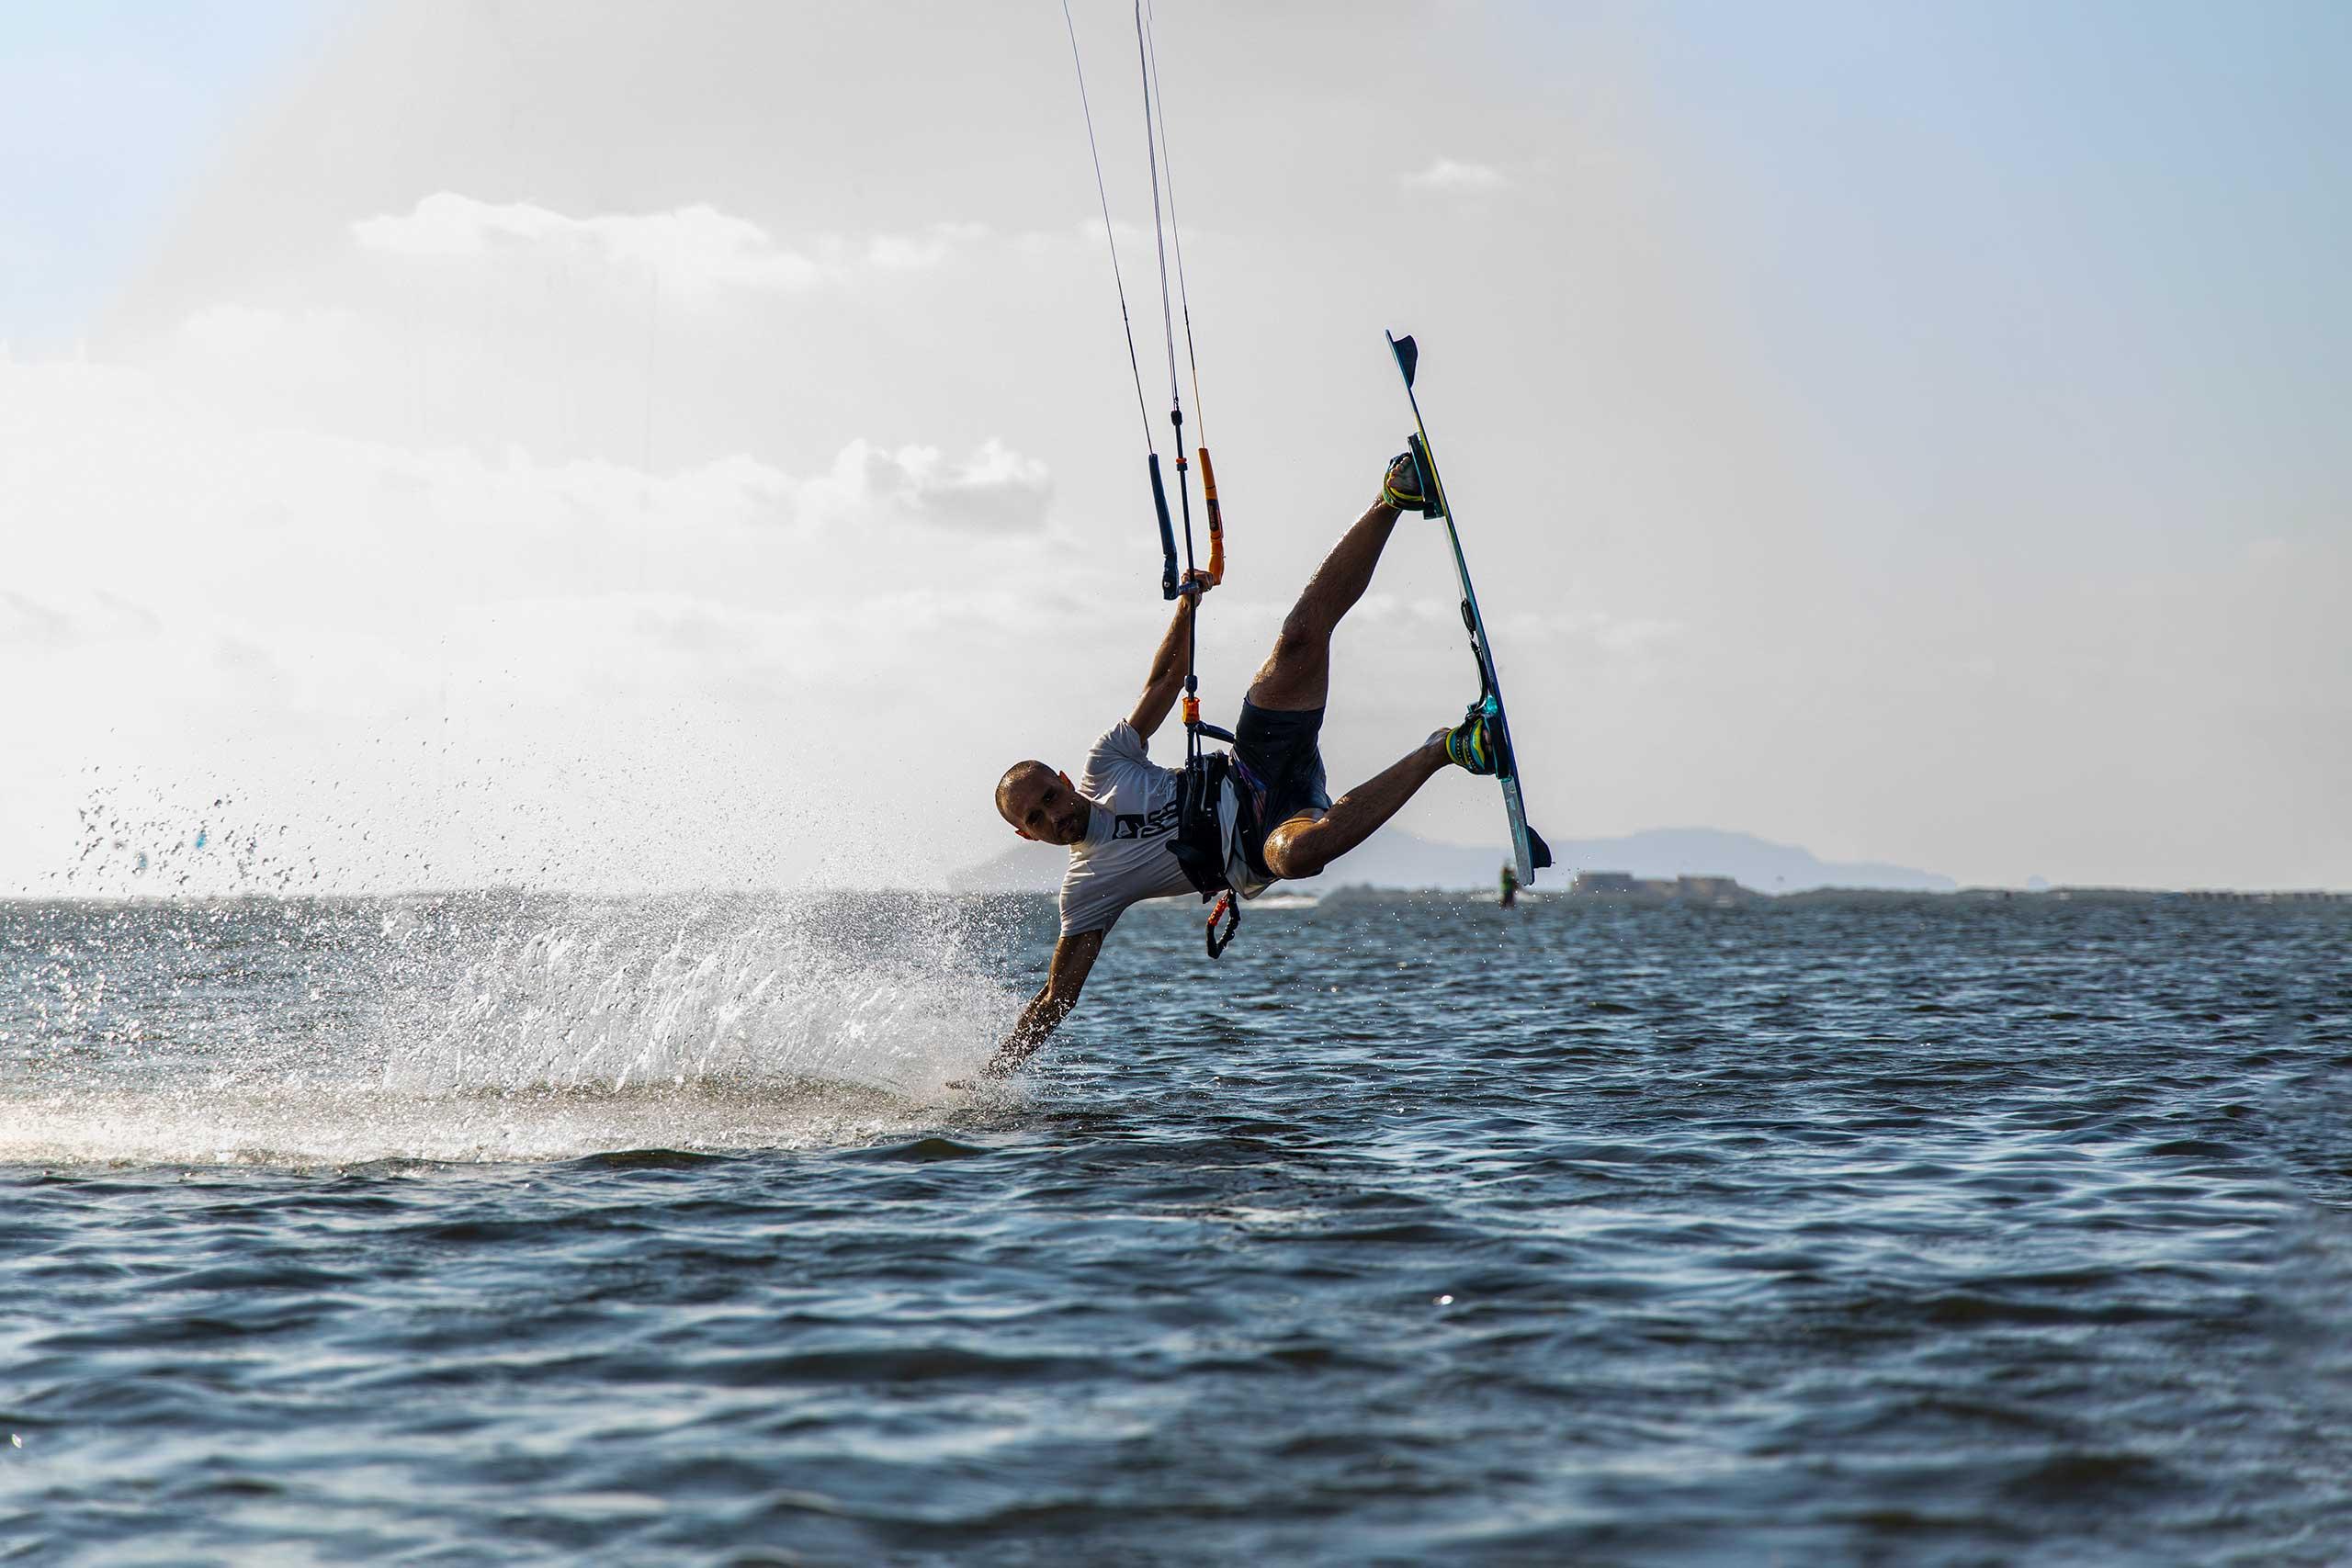 Scopri il kitesurf con noi